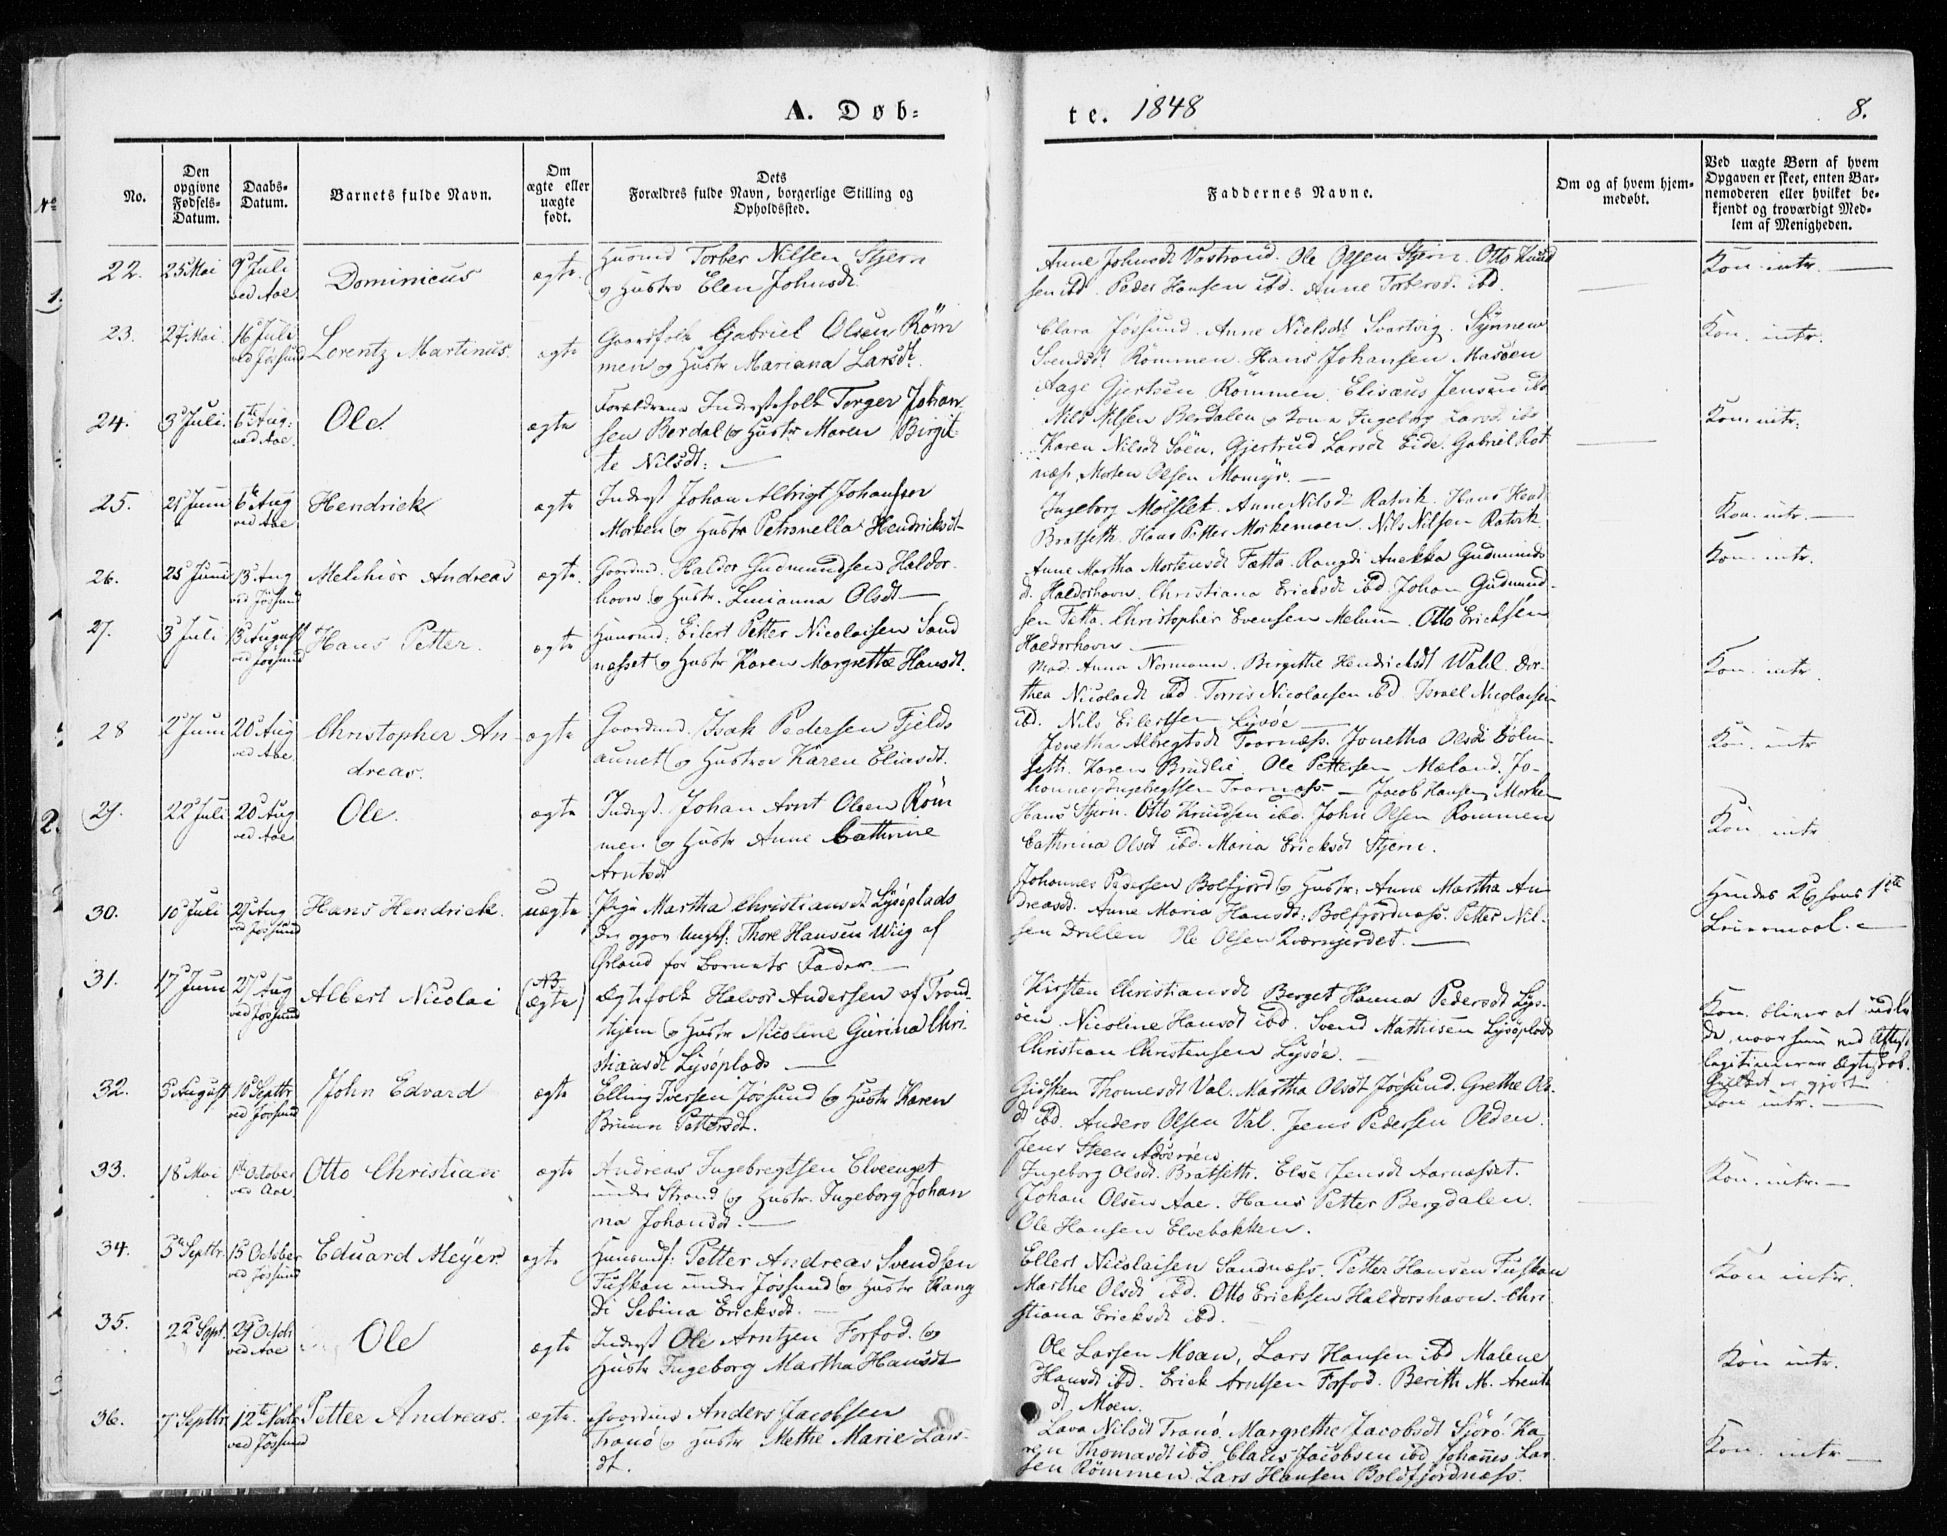 SAT, Ministerialprotokoller, klokkerbøker og fødselsregistre - Sør-Trøndelag, 655/L0677: Parish register (official) no. 655A06, 1847-1860, p. 8